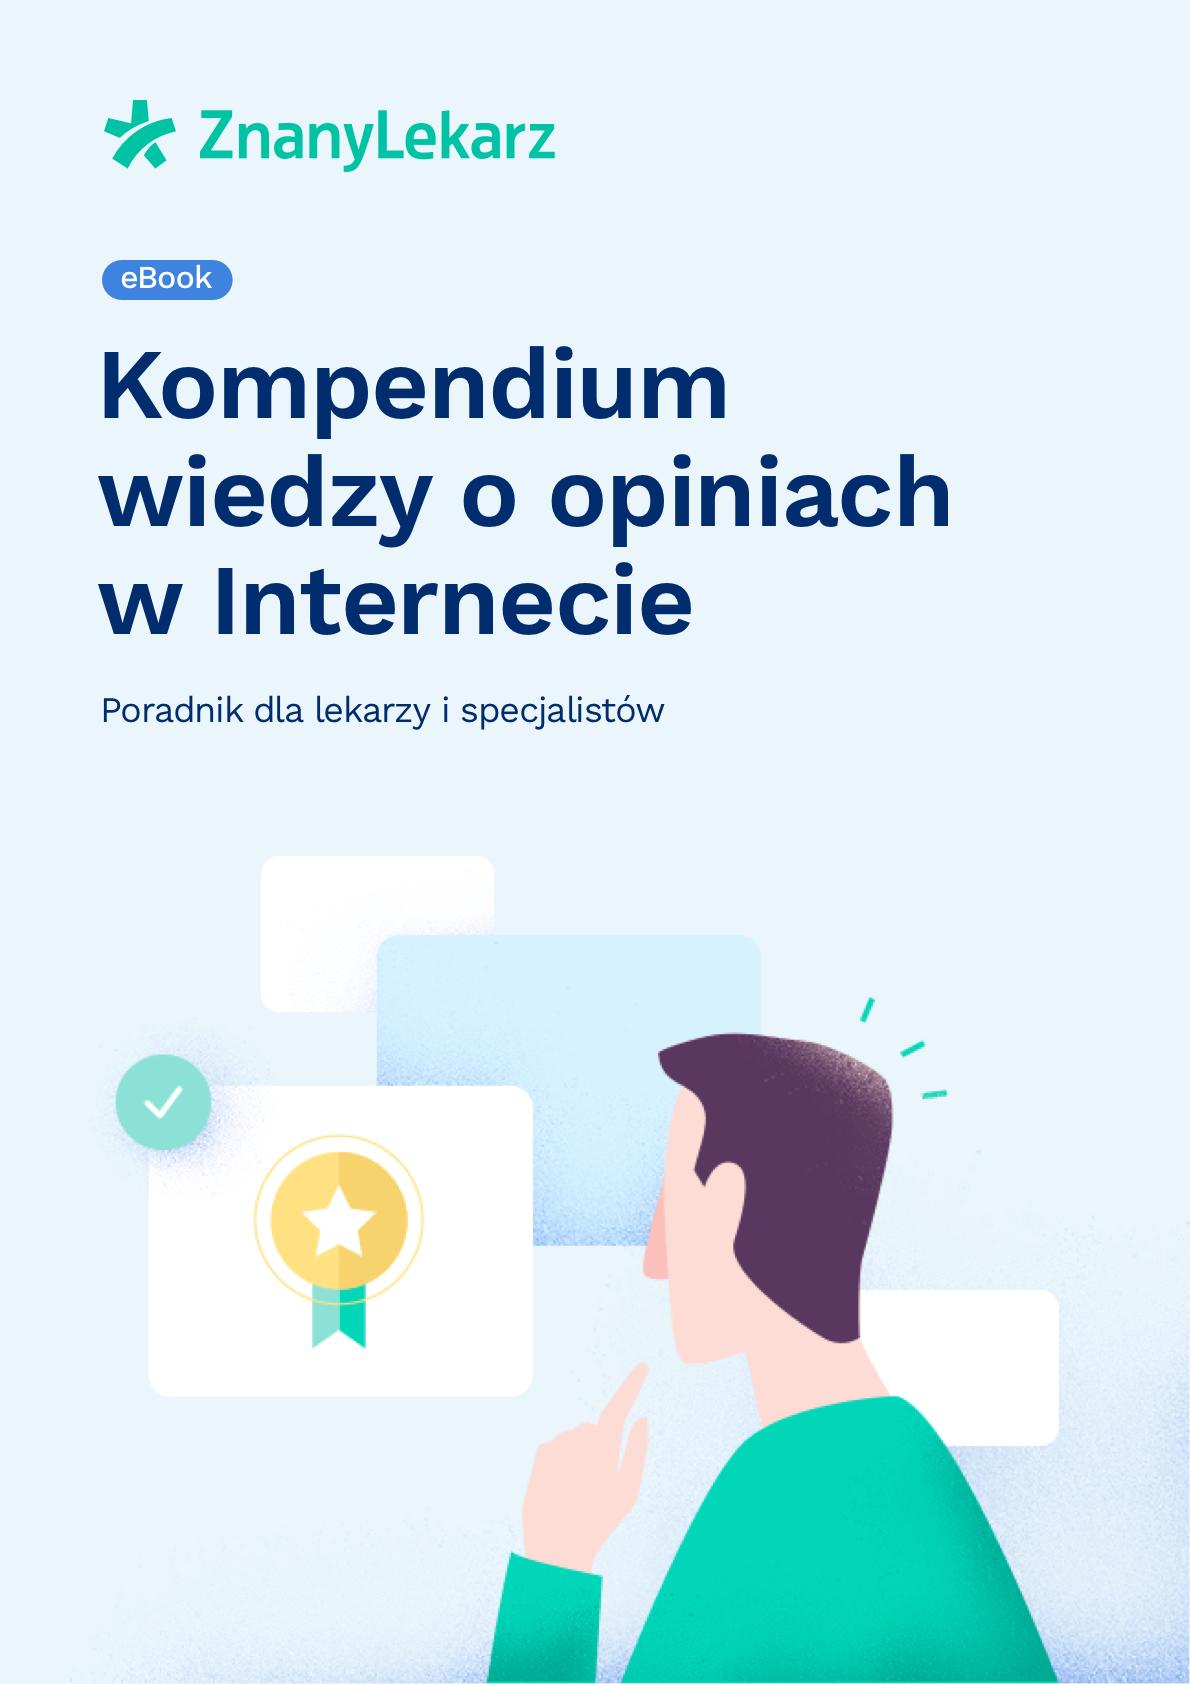 pl-ebook-kompendium-wiedzy-opiniach-w-internecie